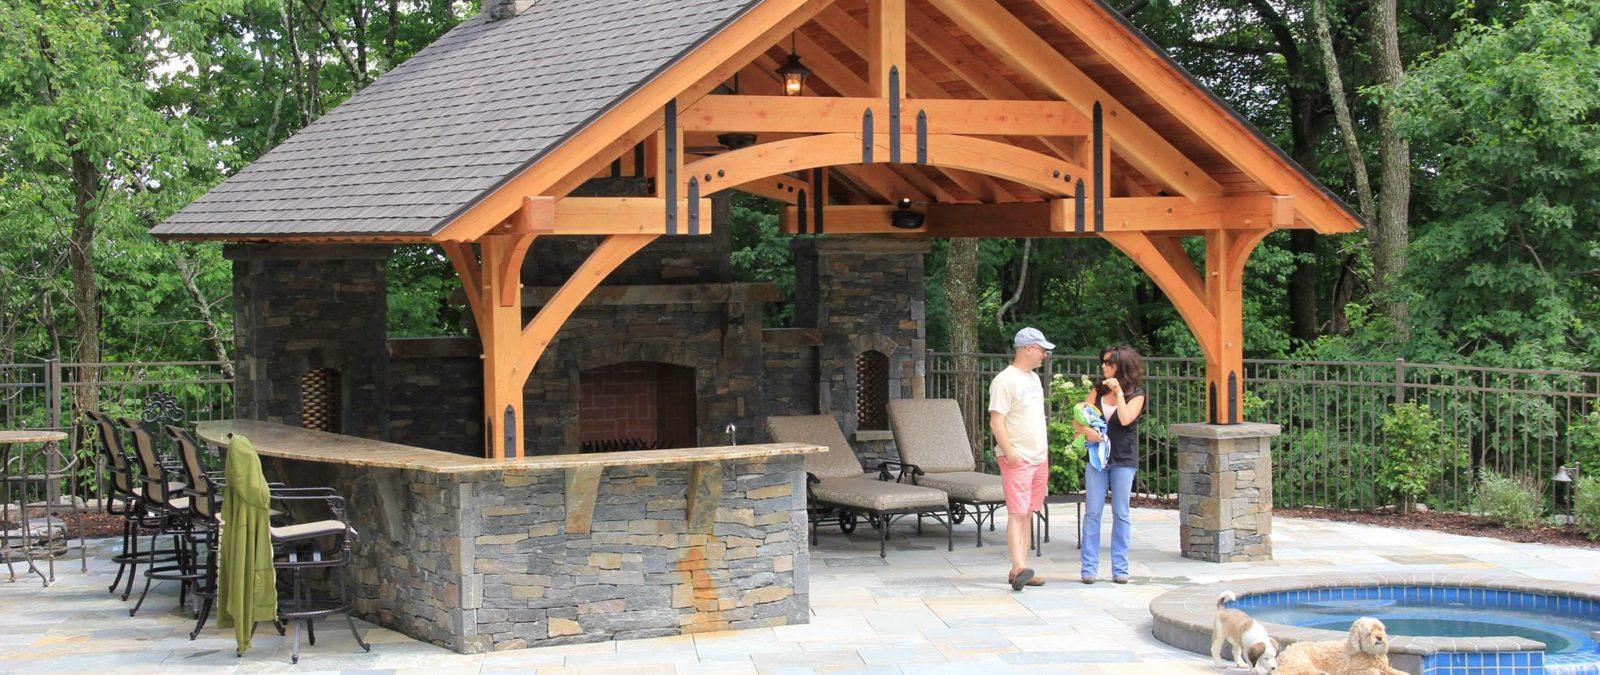 grand teton timber frame pavilion